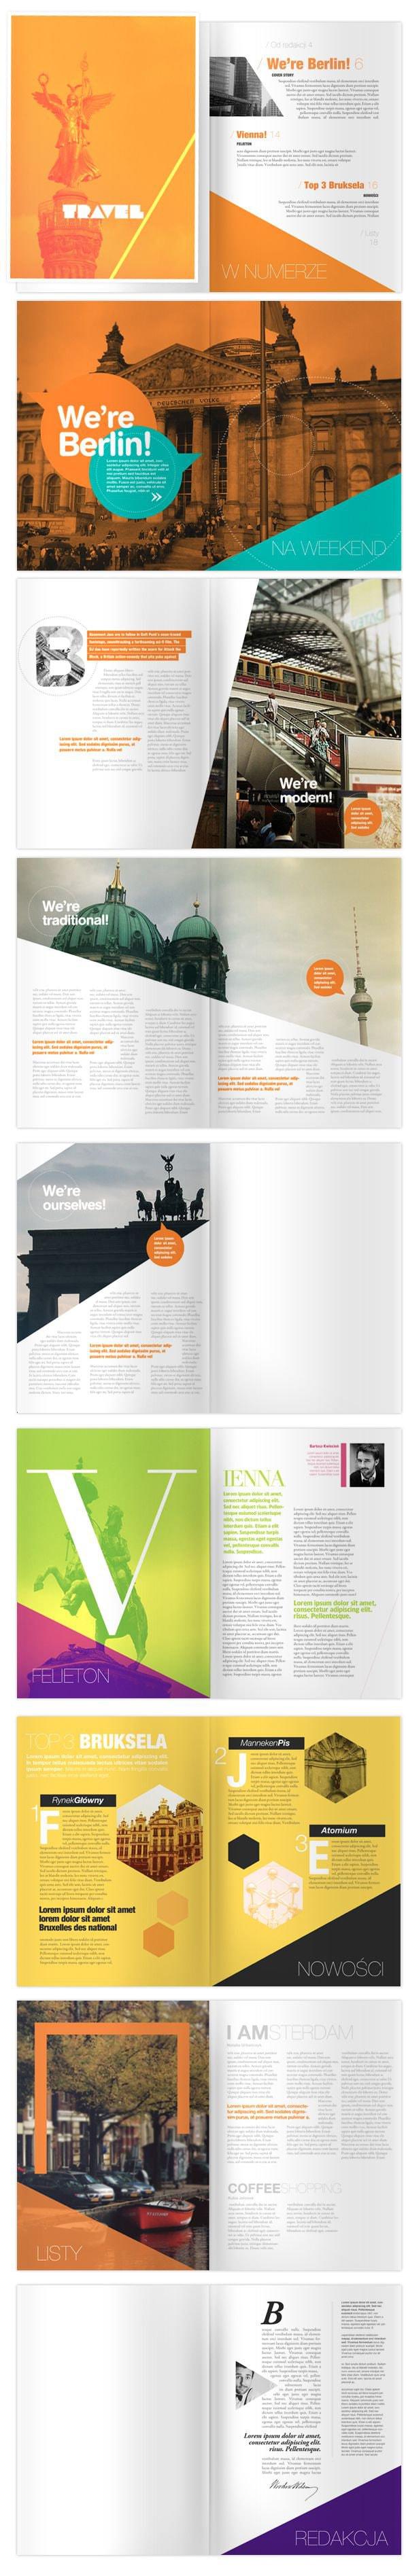 design-principles-20